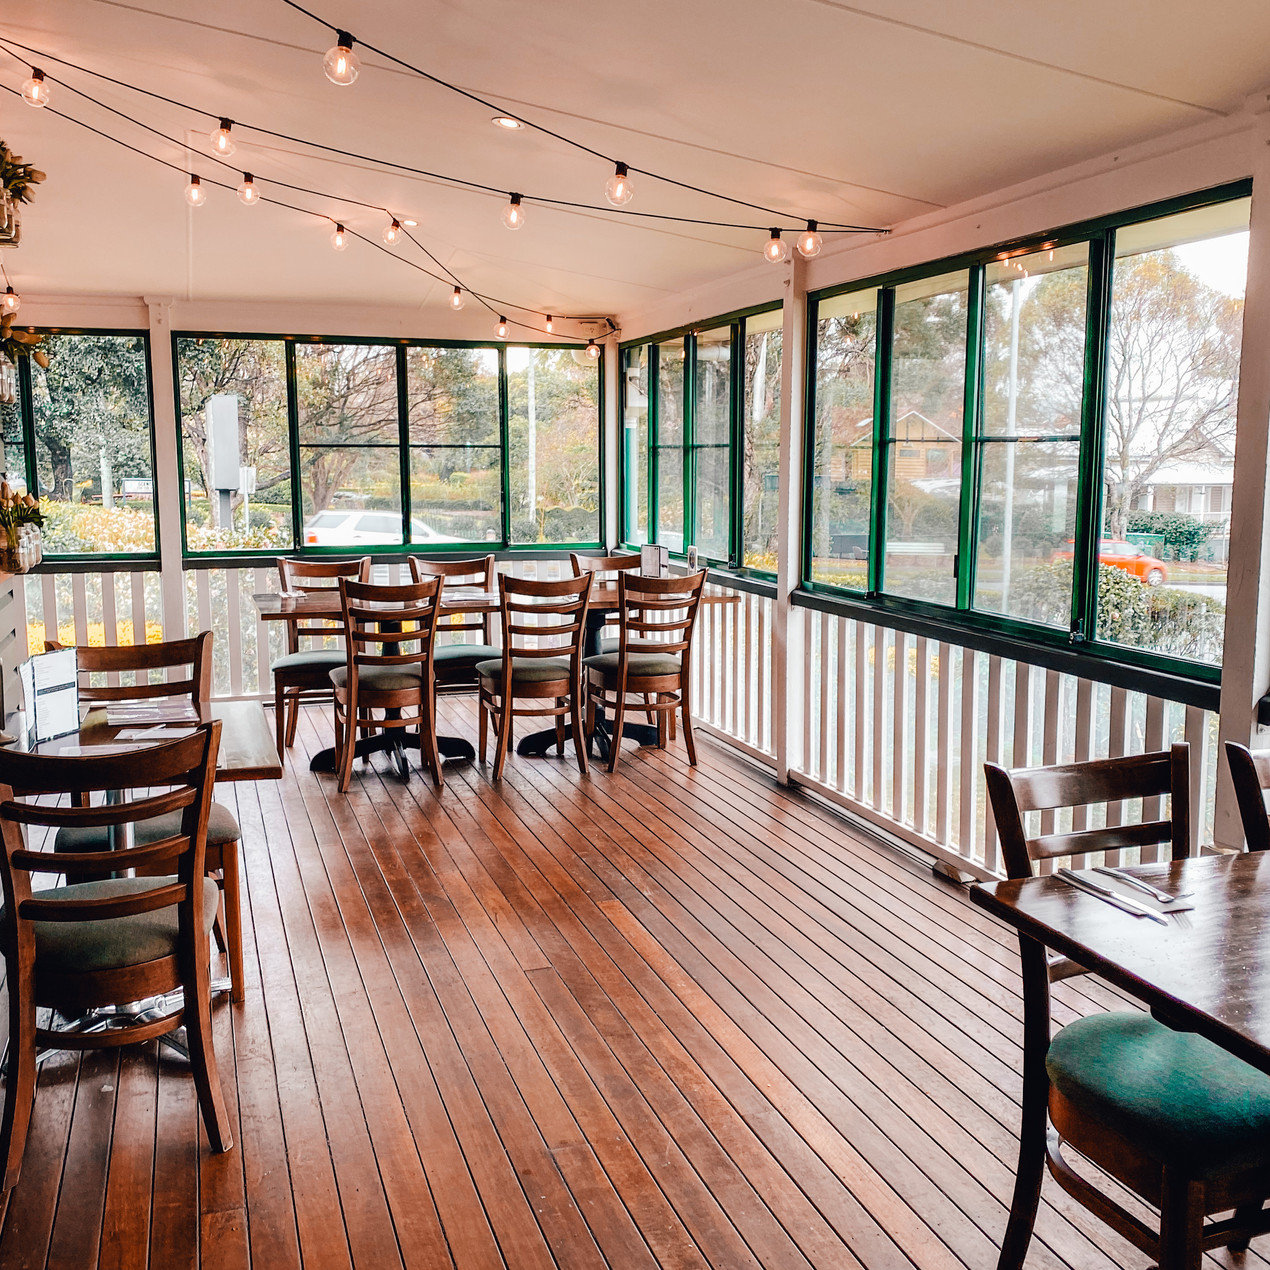 Urban Grounds Cafe toowoomba